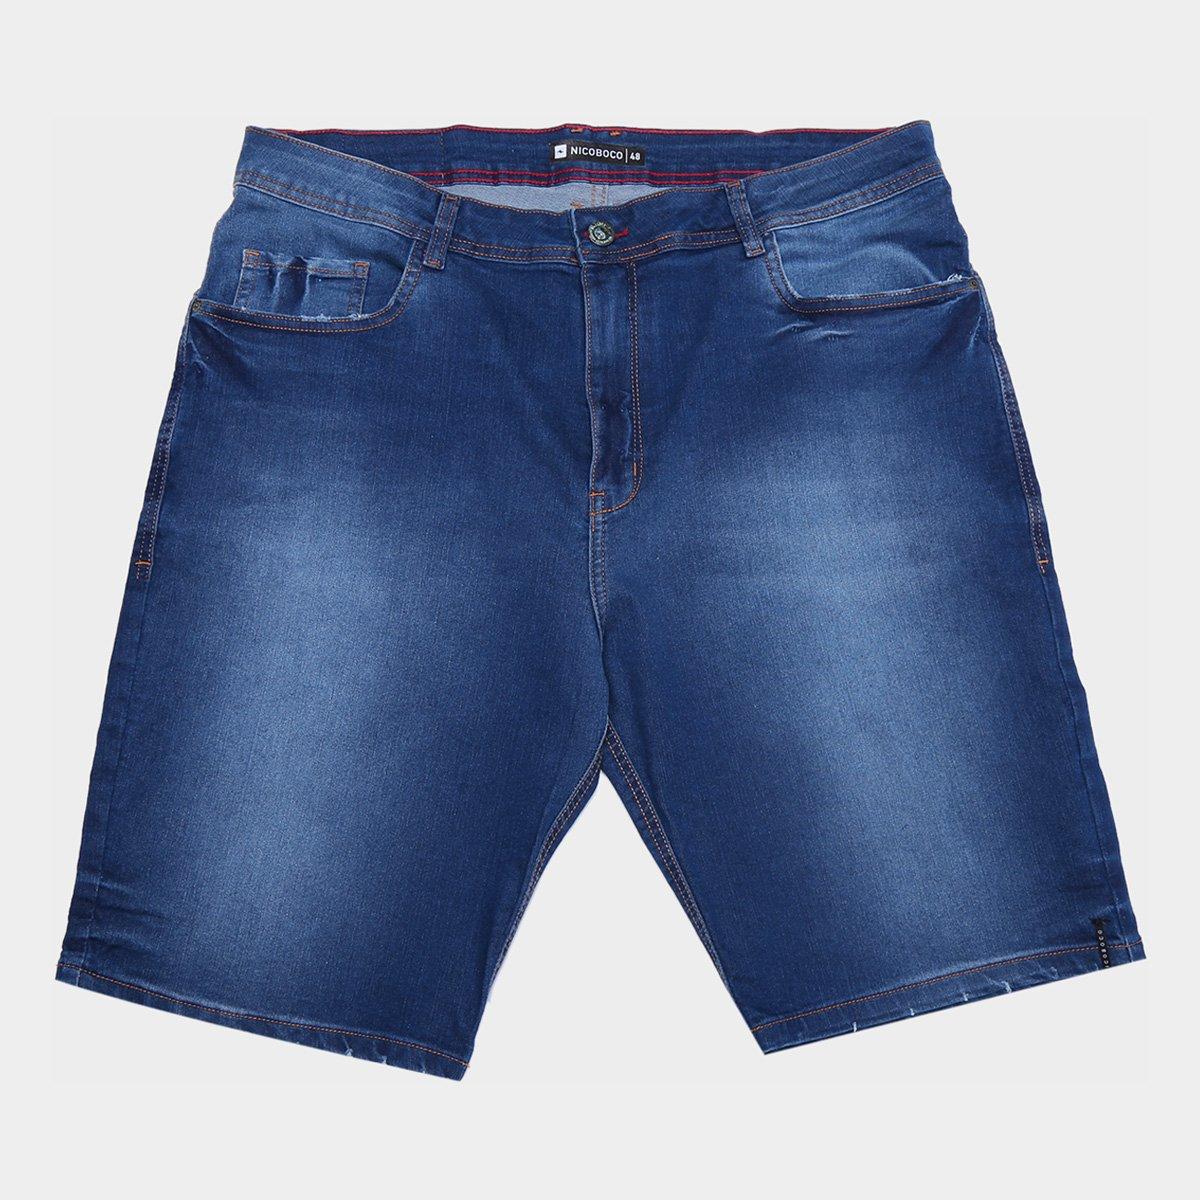 Bermuda Jeans Nicoboco Lisa Masculina